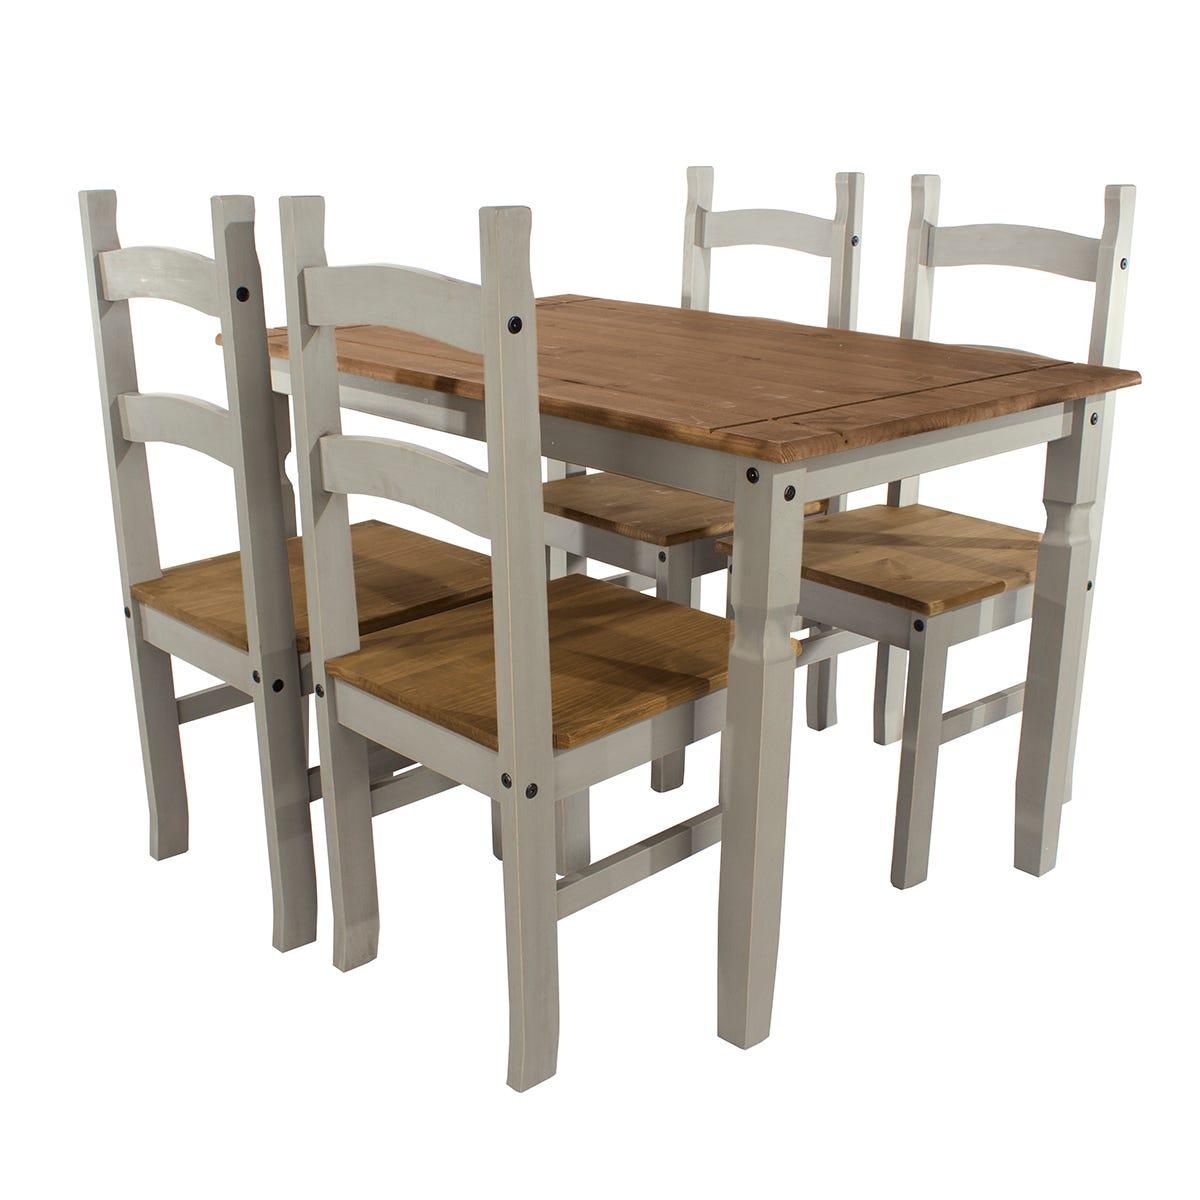 Halea Large Rectangular Dining Table & 4 Chairs - Grey